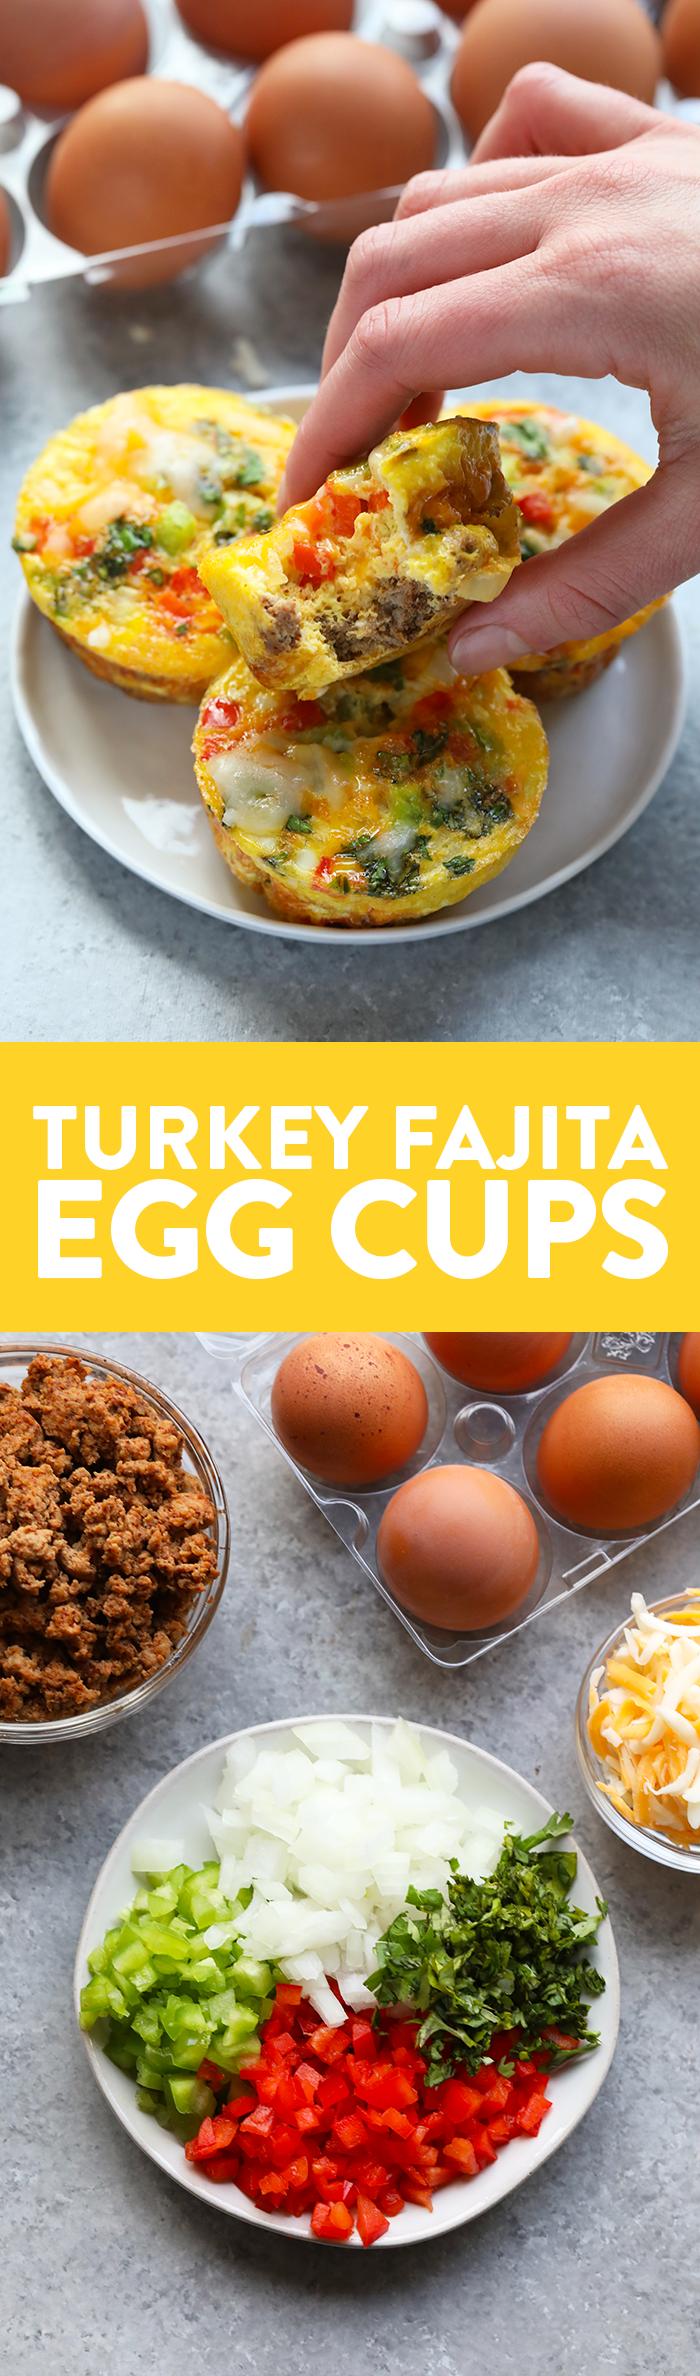 Turkey Fajita Egg Cups